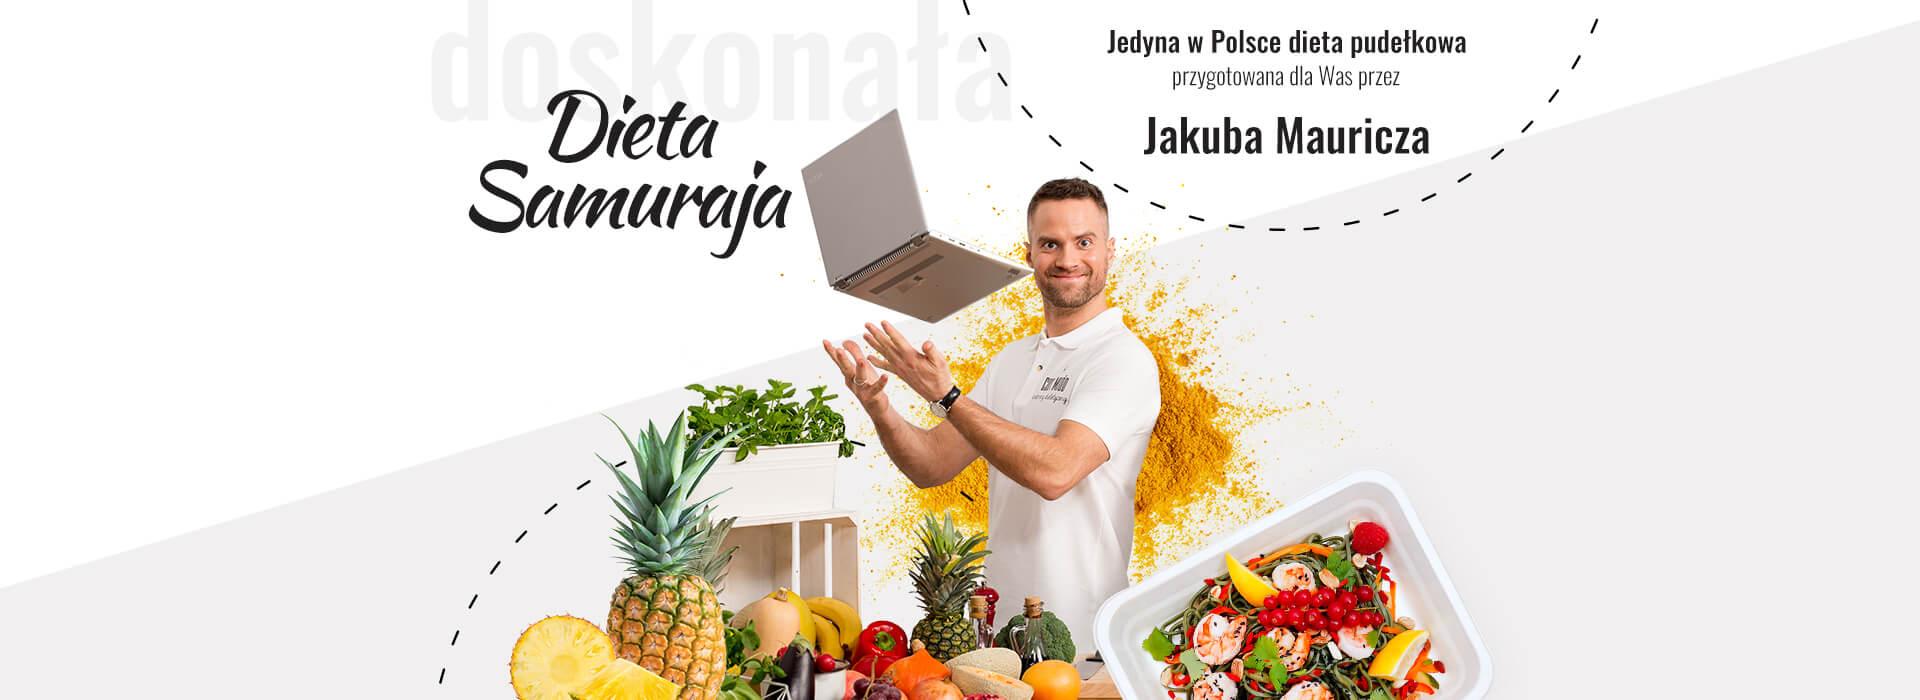 Dieta samuraja by Jakub Mauricz - Cud i Miód